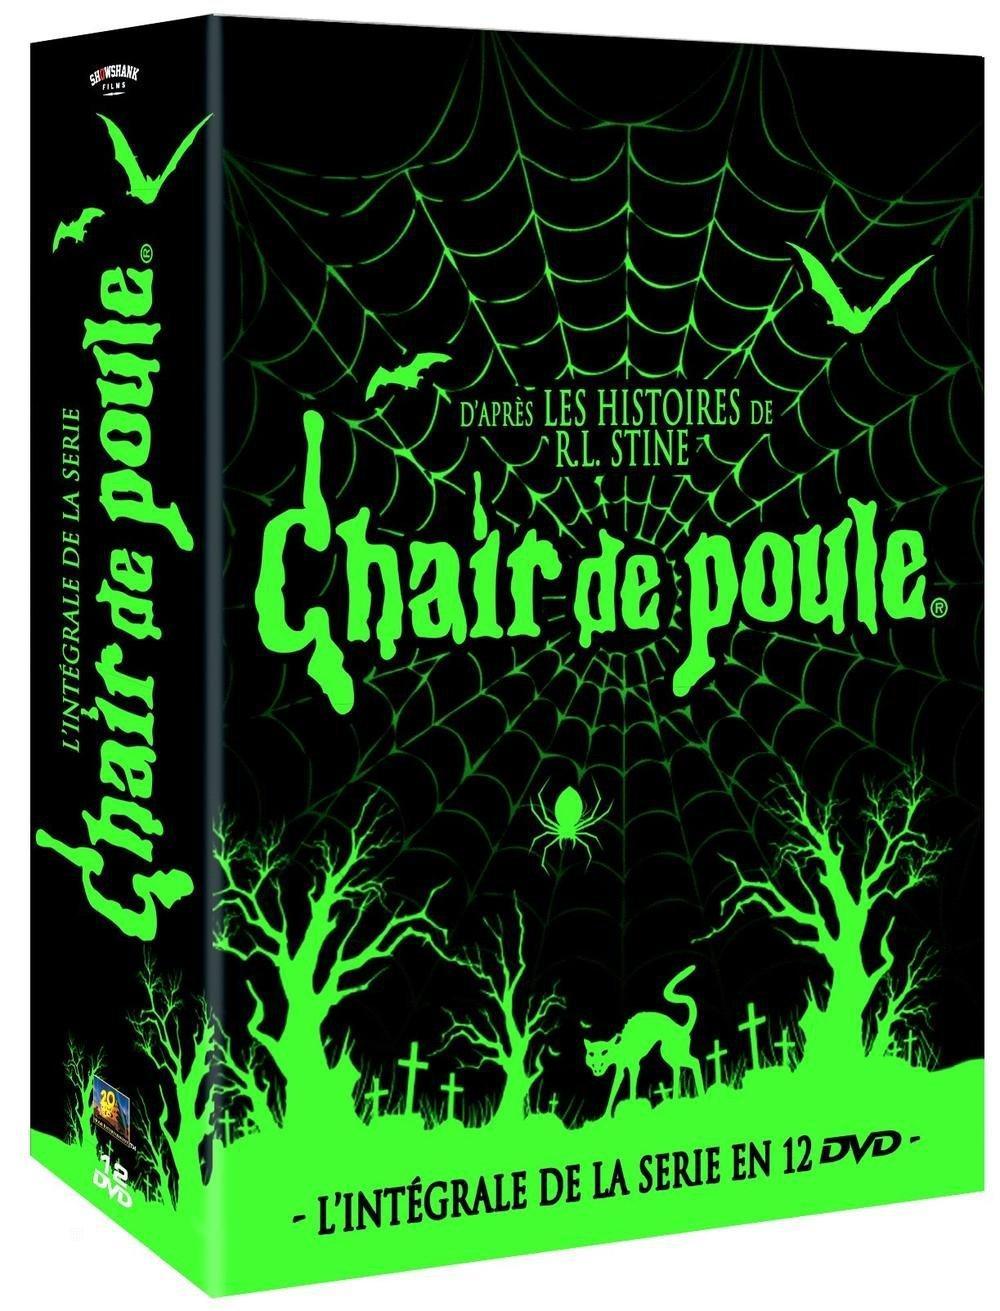 Coffret DVD Chair de Poule : L'intégrale (12 DVD)